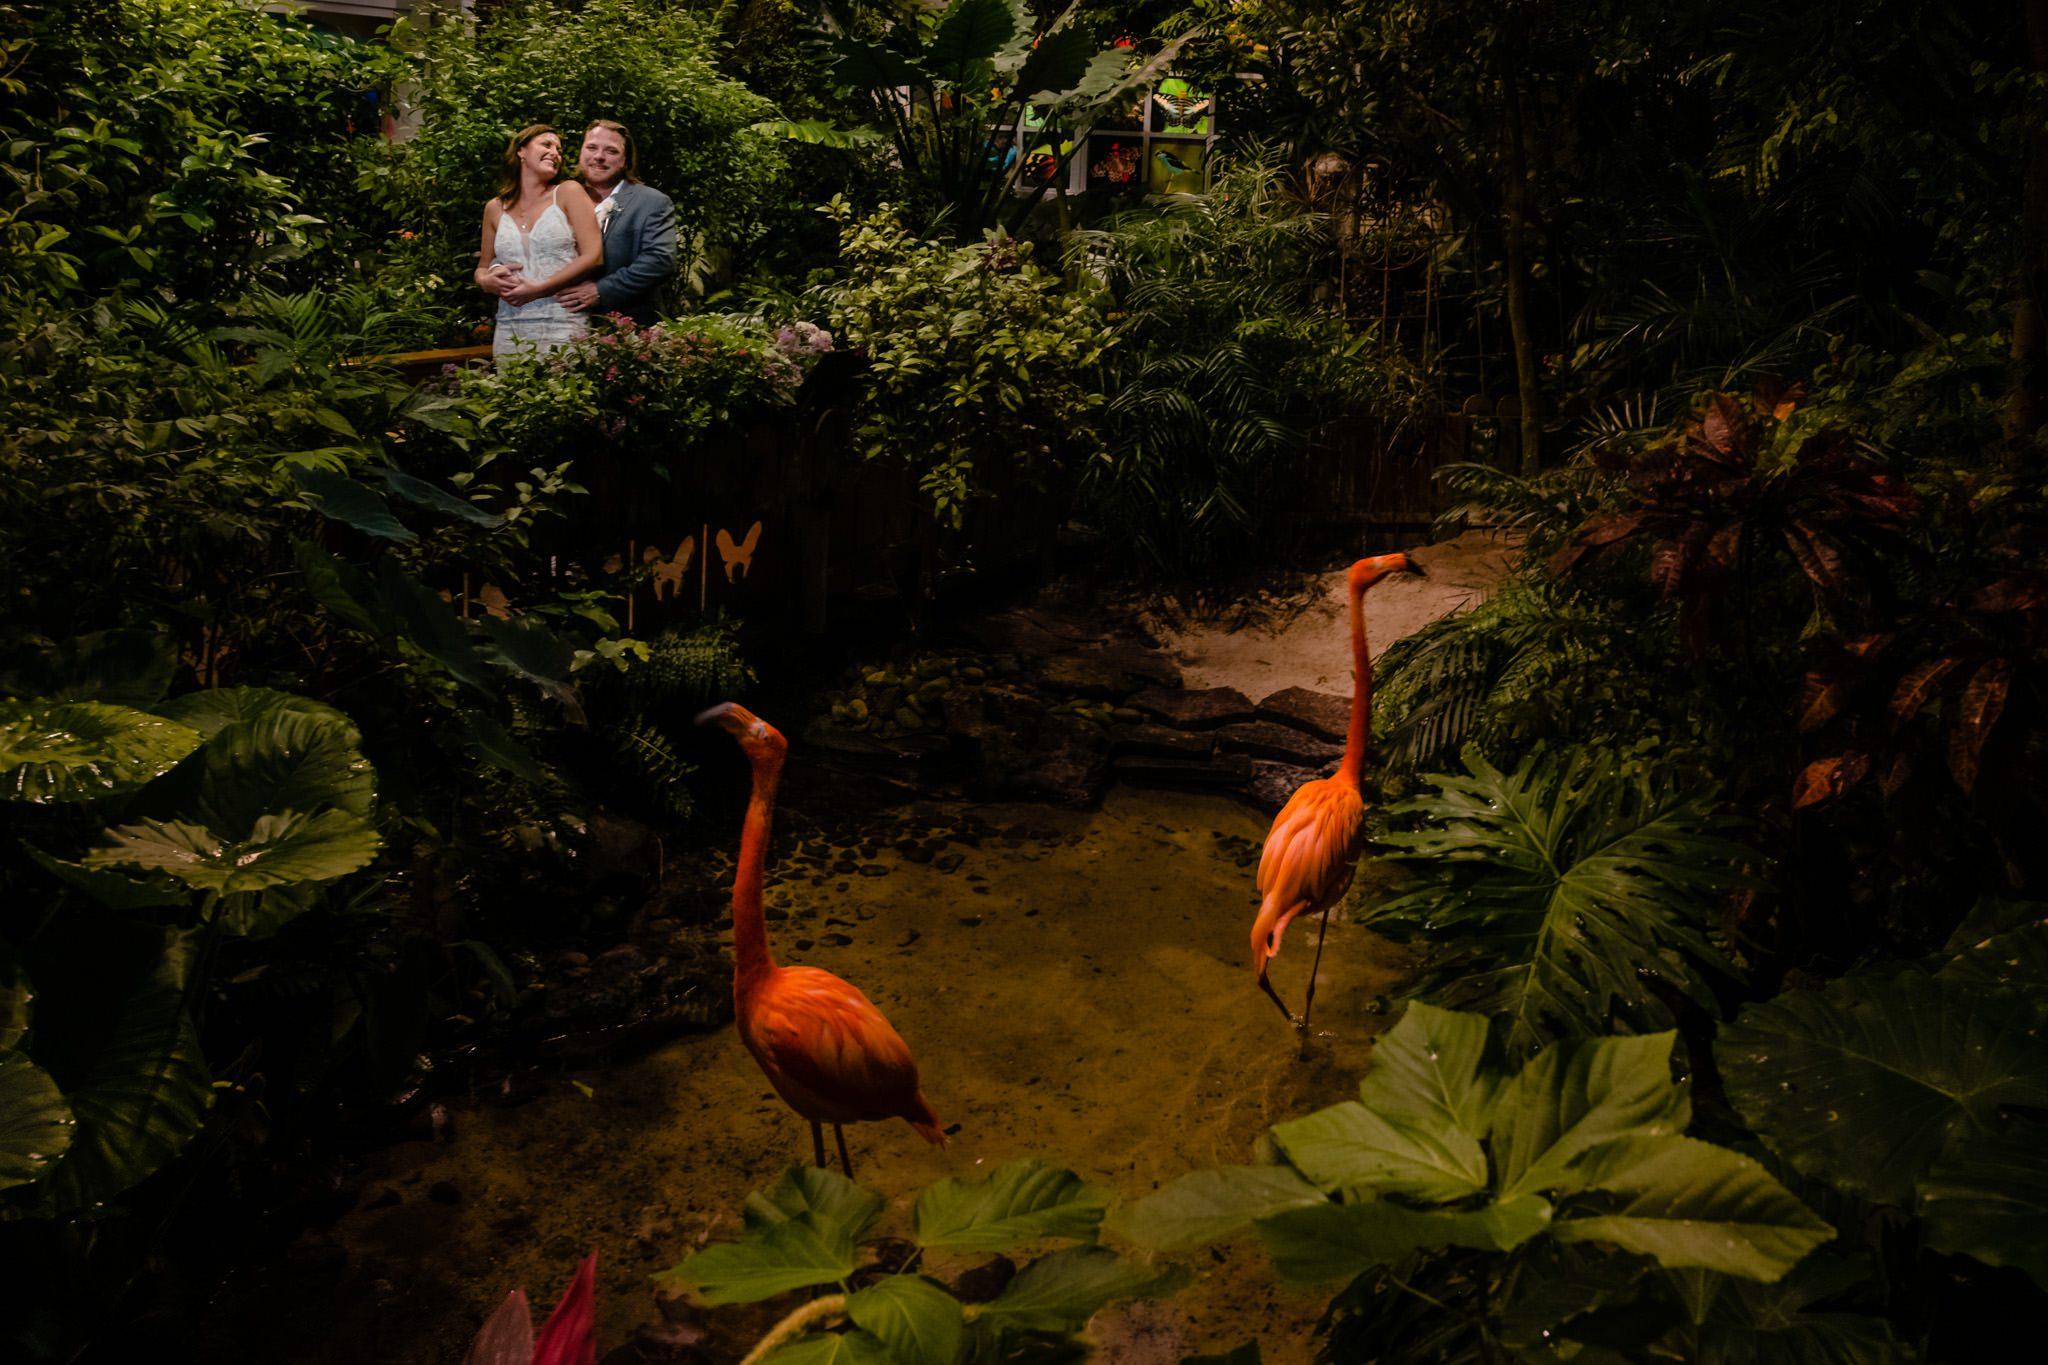 wedding couple behind the flamingos rhett scarlett at key west butterfly conservatory